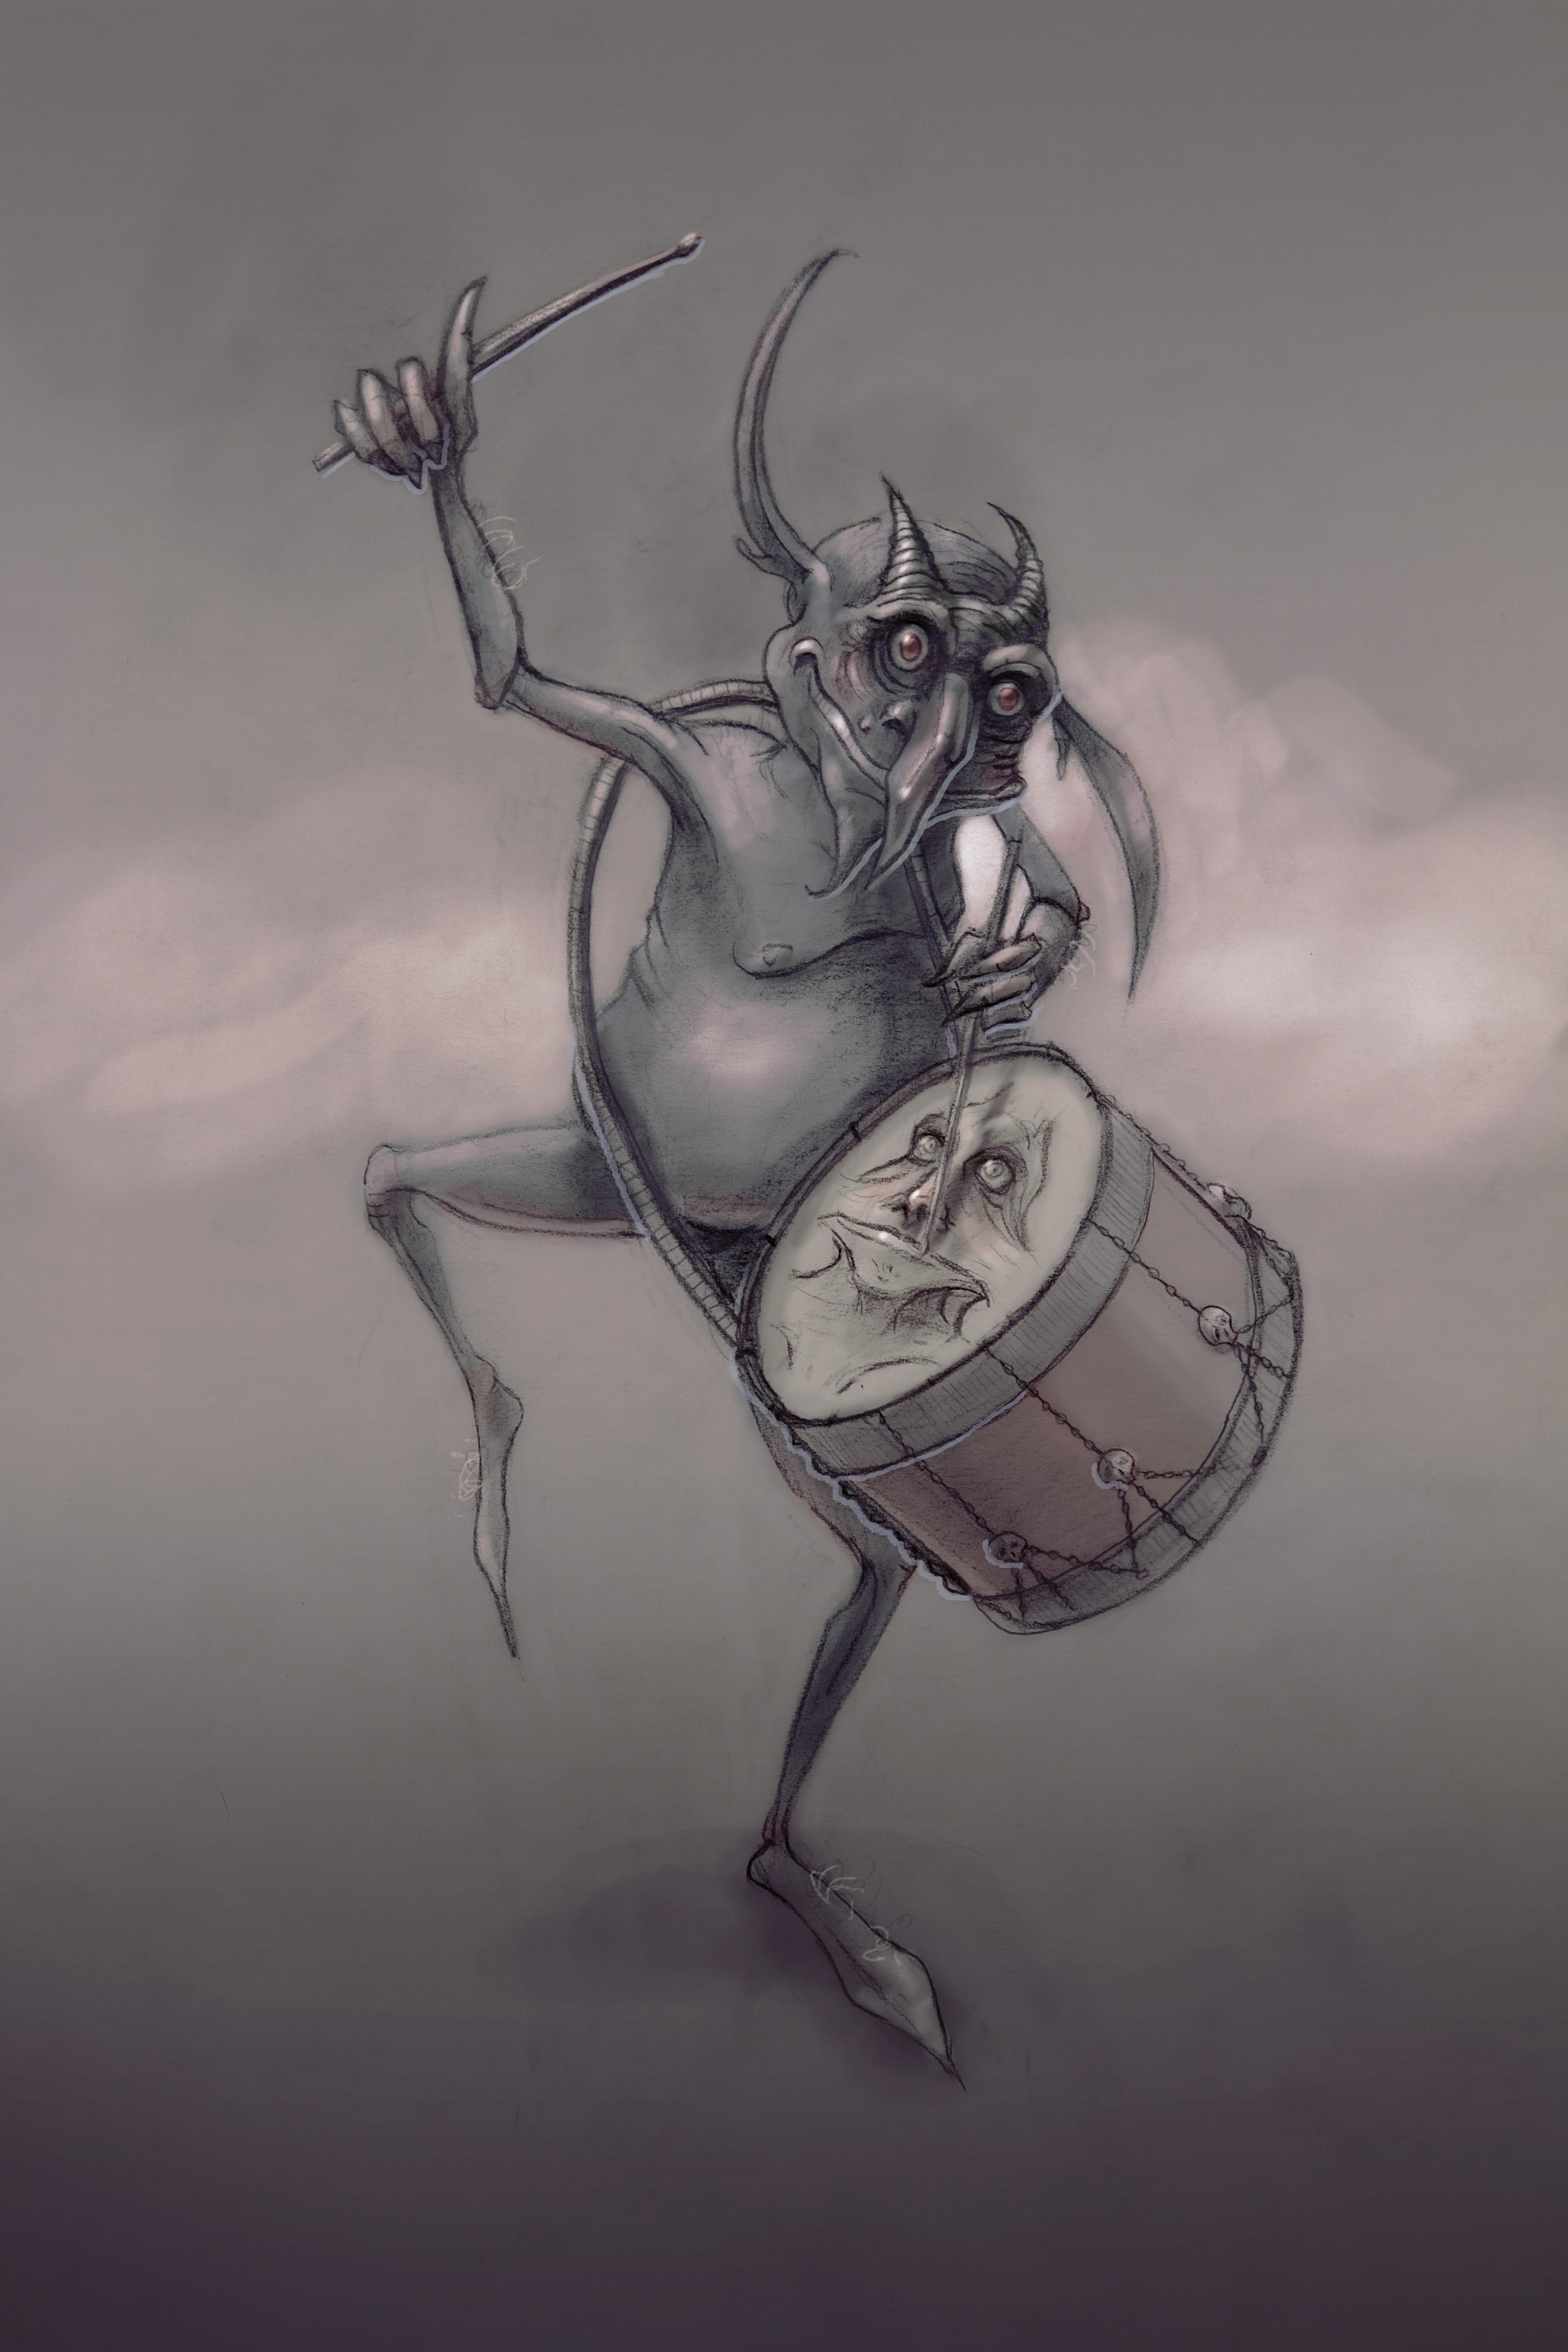 The Devil's Drummer